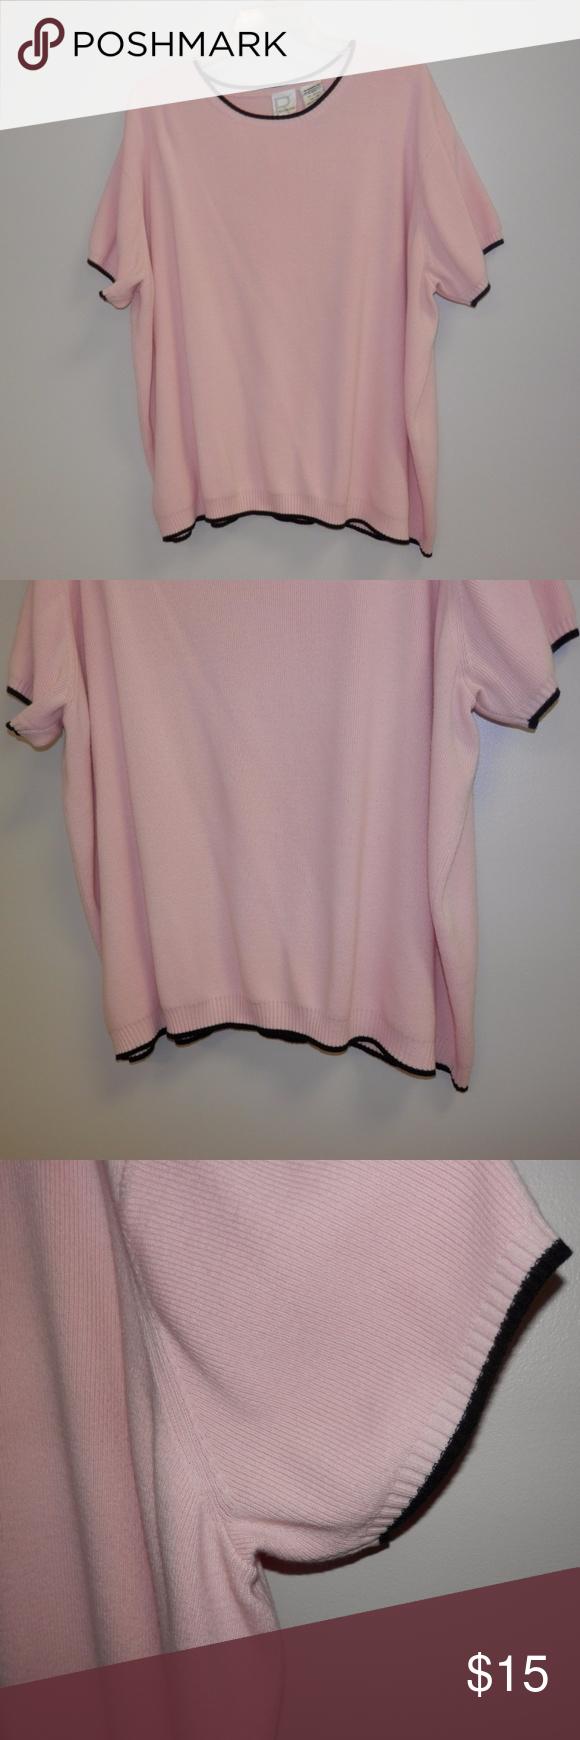 2X Roman's Light Pink Short Sleeve Sweater Roman's Size 2X light ...